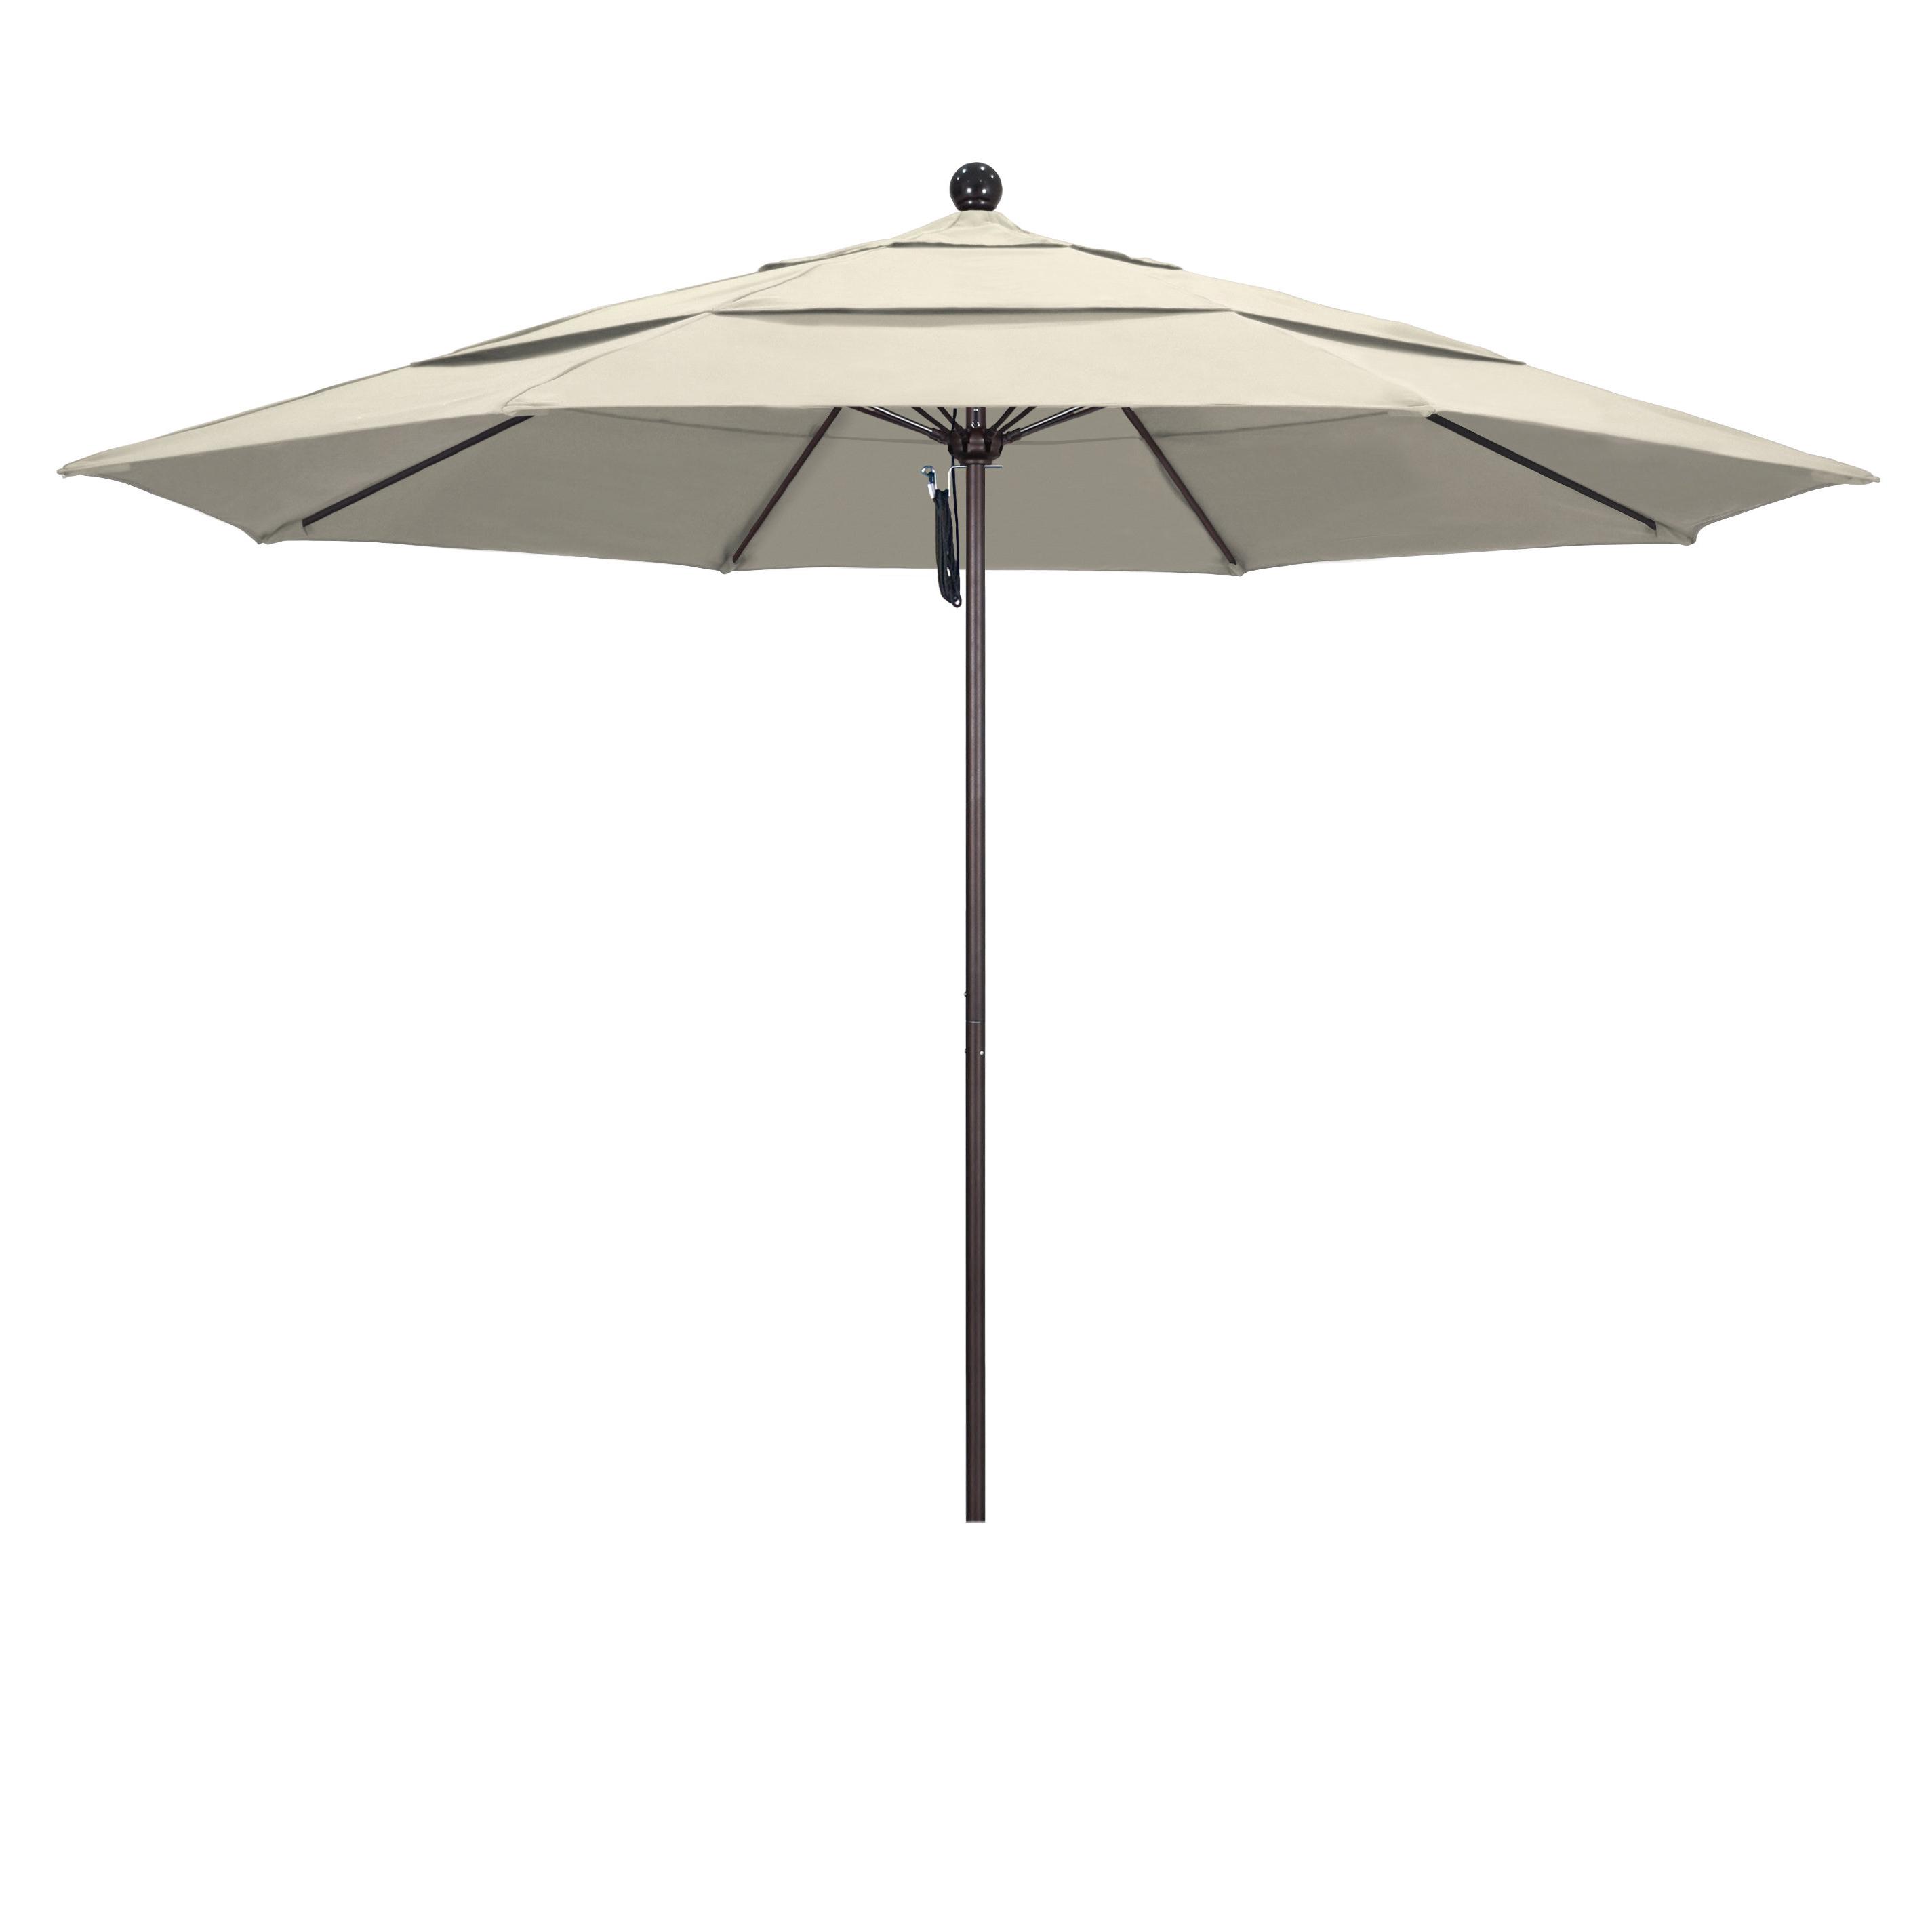 Duxbury 11' Market Umbrella In Latest Caravelle Market Sunbrella Umbrellas (View 10 of 20)